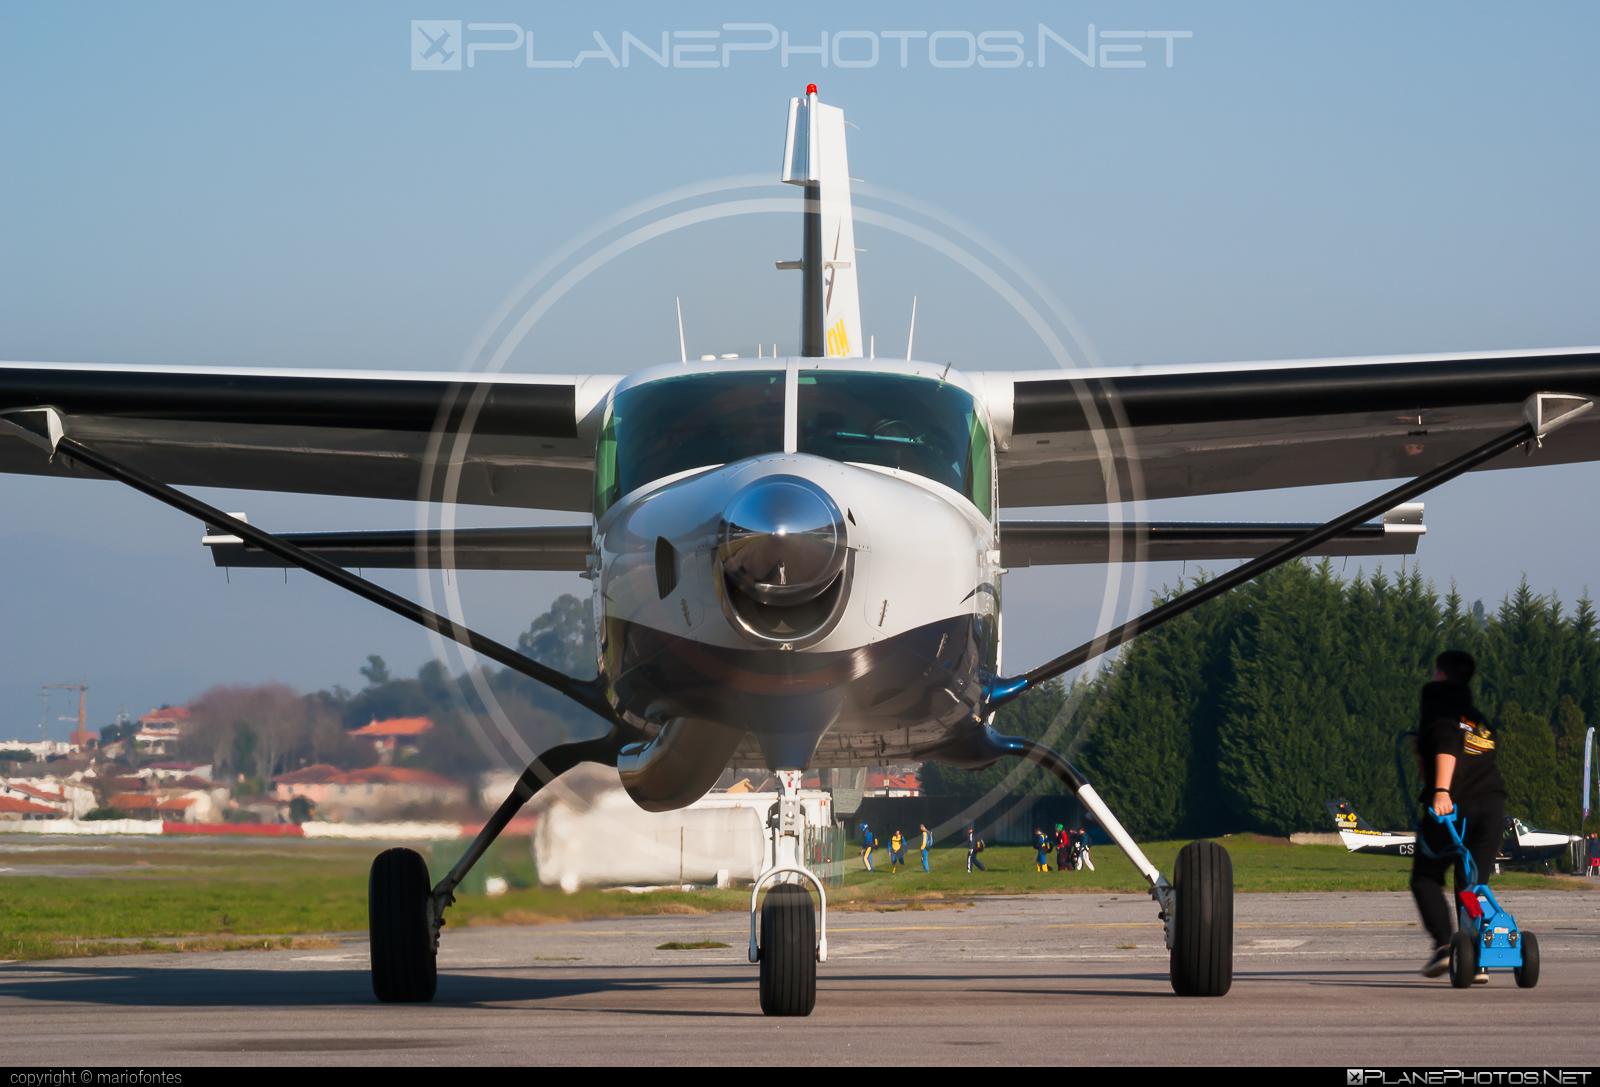 Cessna 208 Caravan I - D-FILL operated by Paranodon Fallschirmsport #cessna #cessna208 #cessna208caravan #cessna208caravani #cessnacaravan #paranodonfallschirmsport